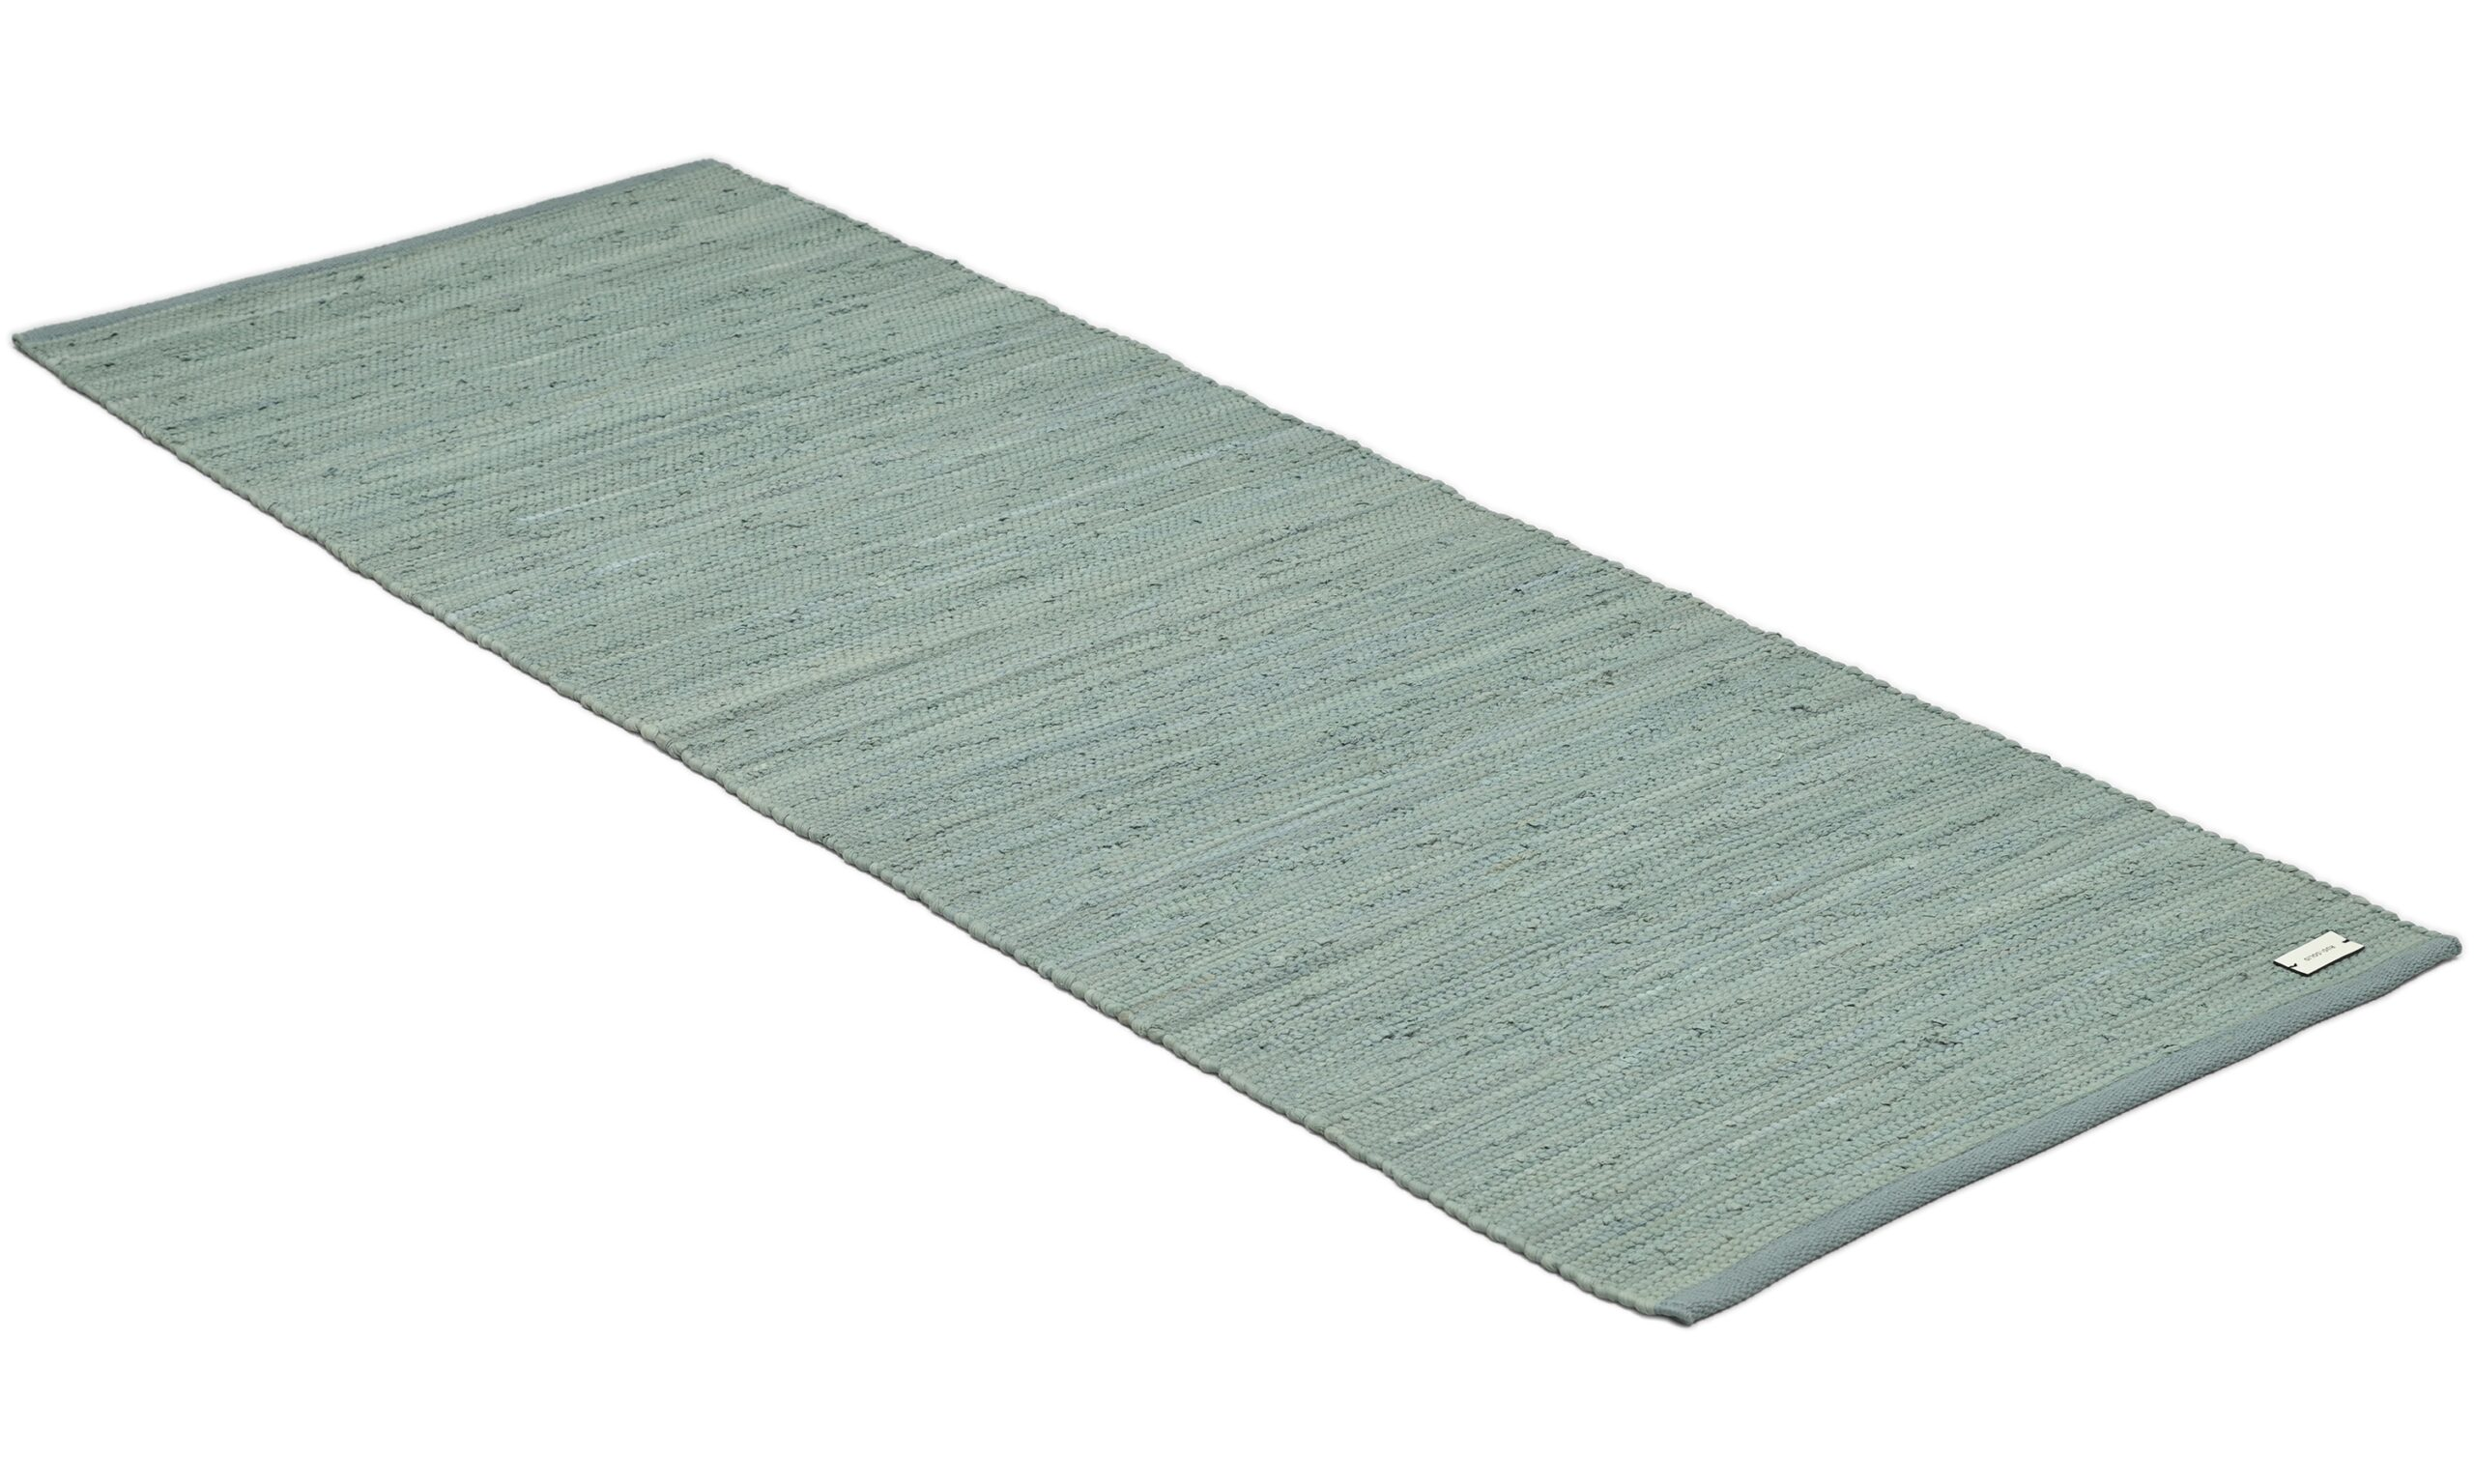 Cotton rug dusty jade - fillerye